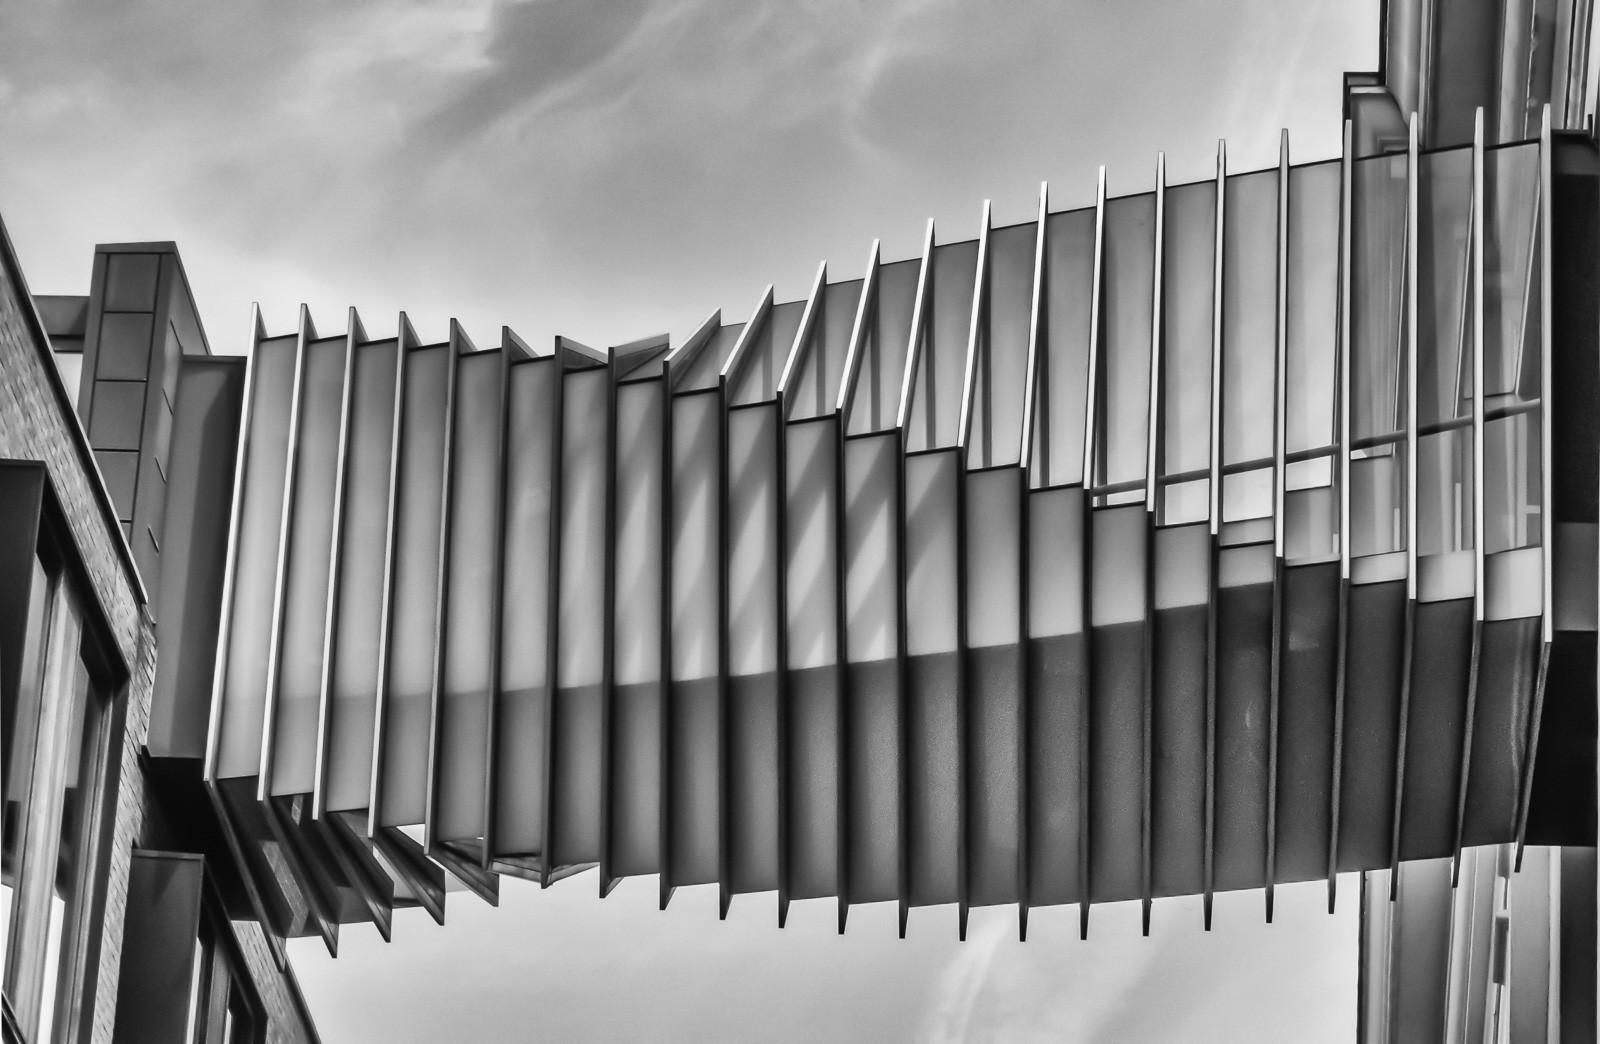 MONO - Twisted Walkway by Pauline McAleese (9 marks)